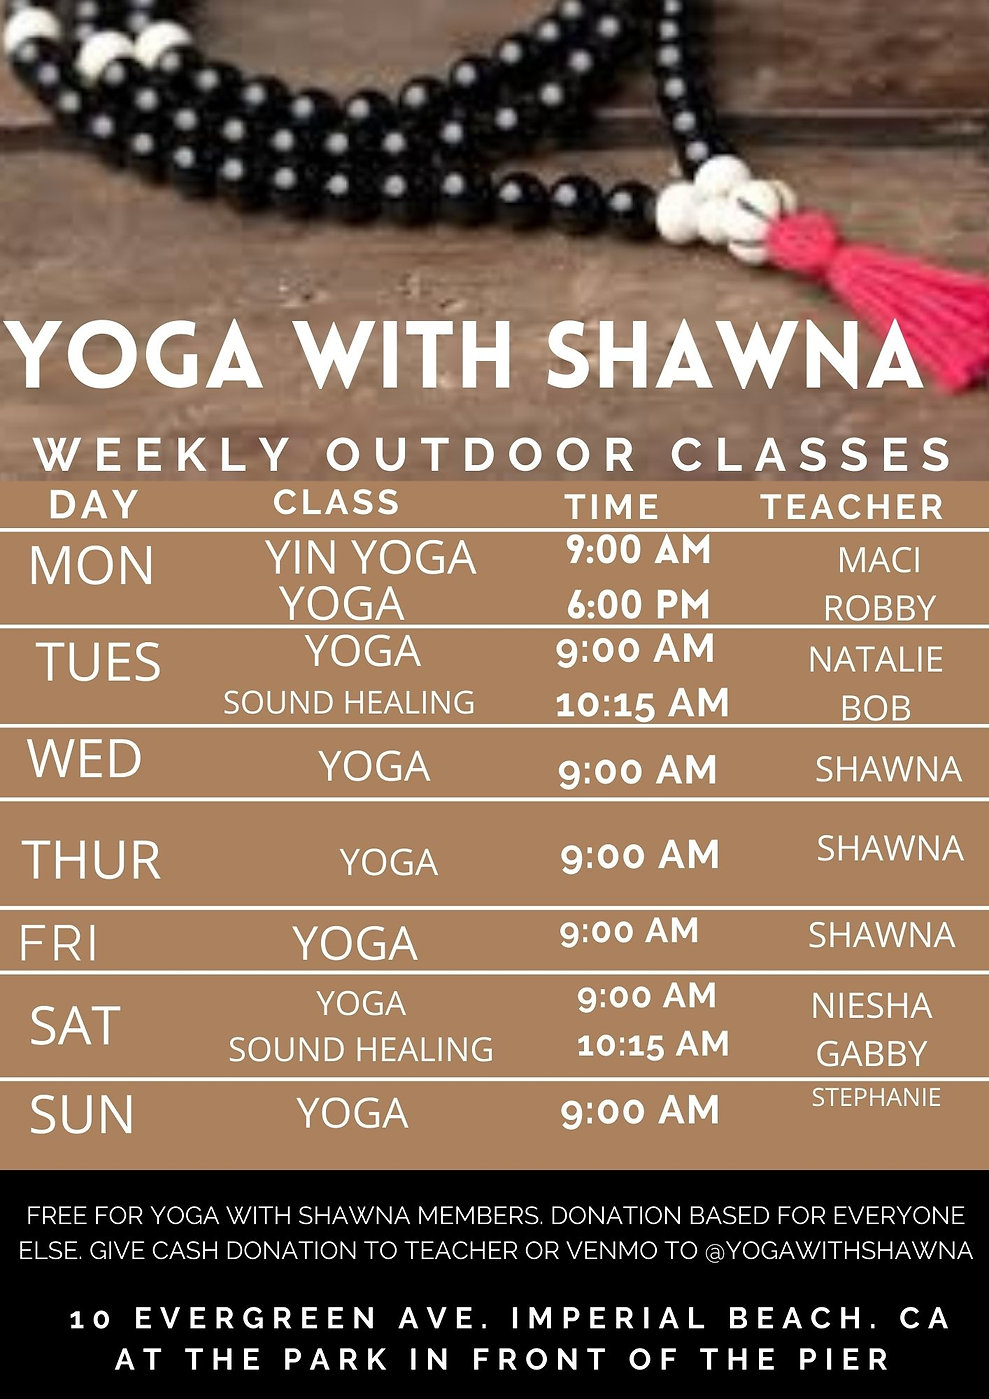 outdoor yoga yws-2.jpg